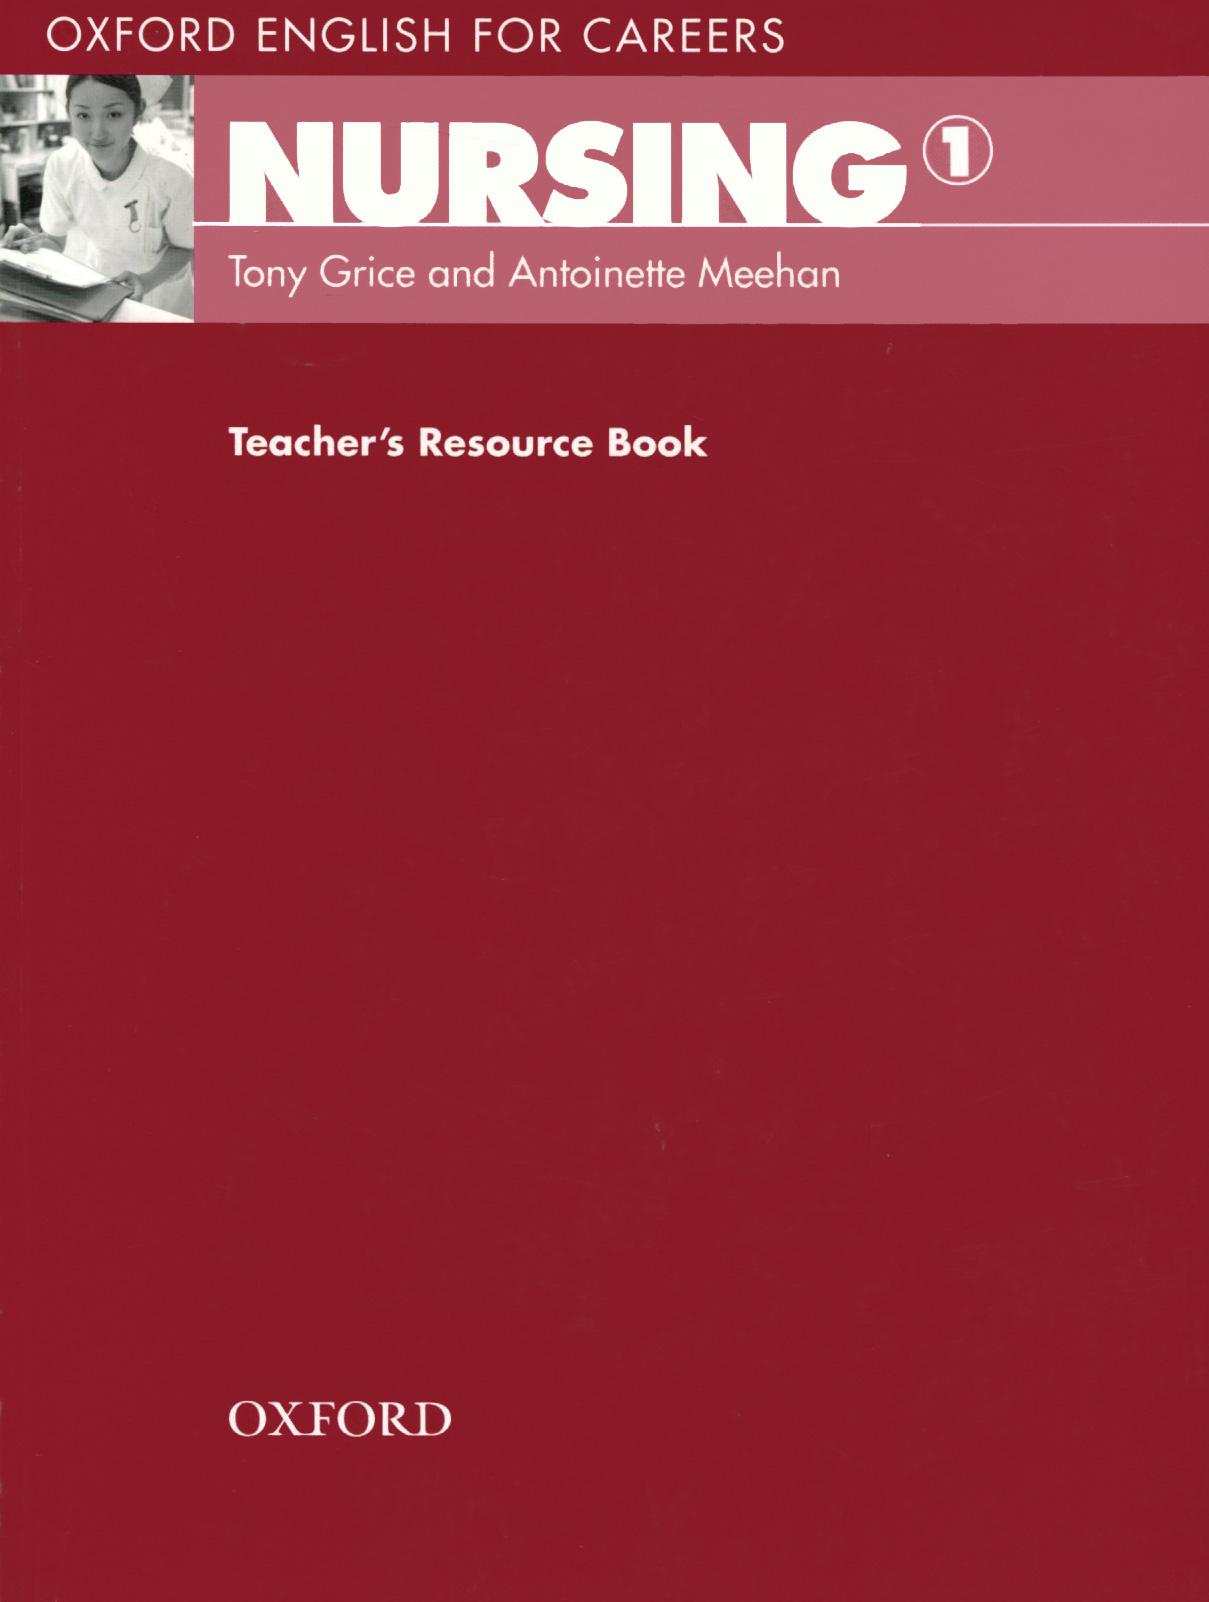 Oxford English for Careers: Nursing 1: Teacher's Resource Book oxford english for careers tourism 3 аудиокурс на 2 cd